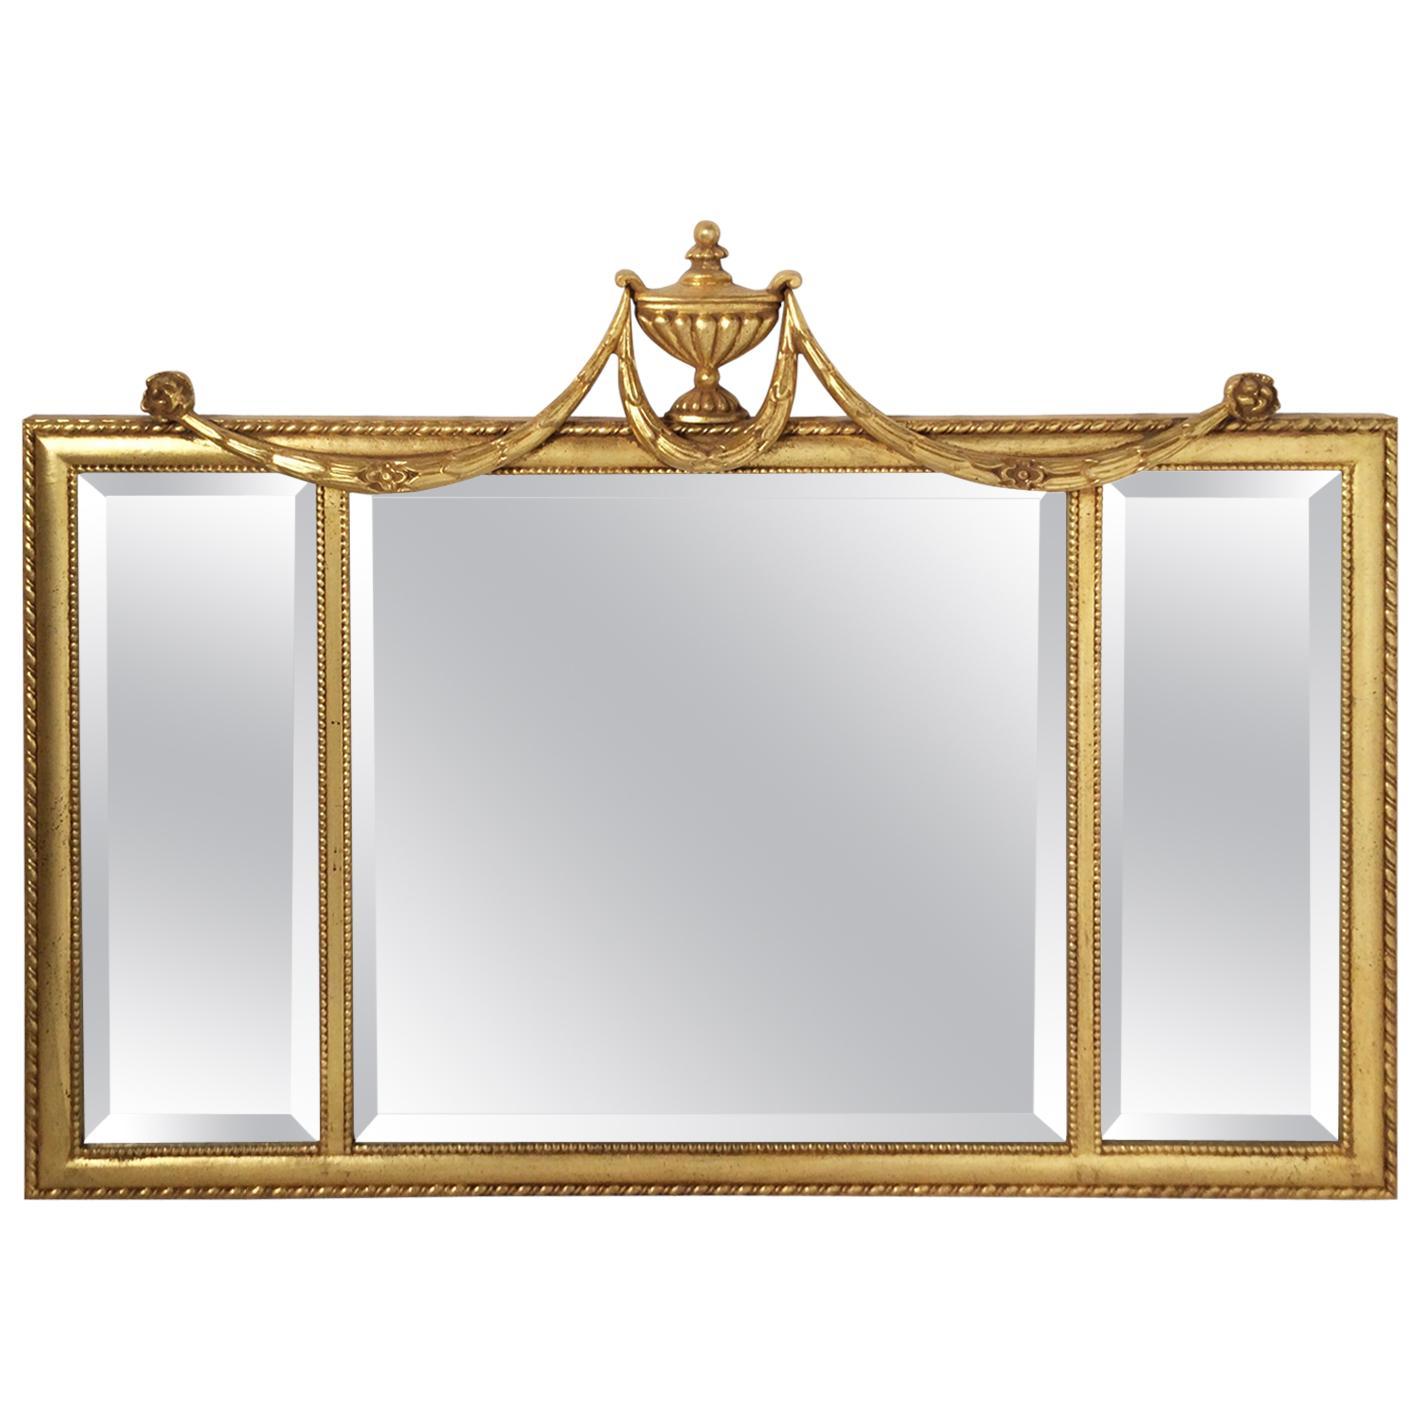 Italian Giltwood Swag Over Mantle Wall Mirror